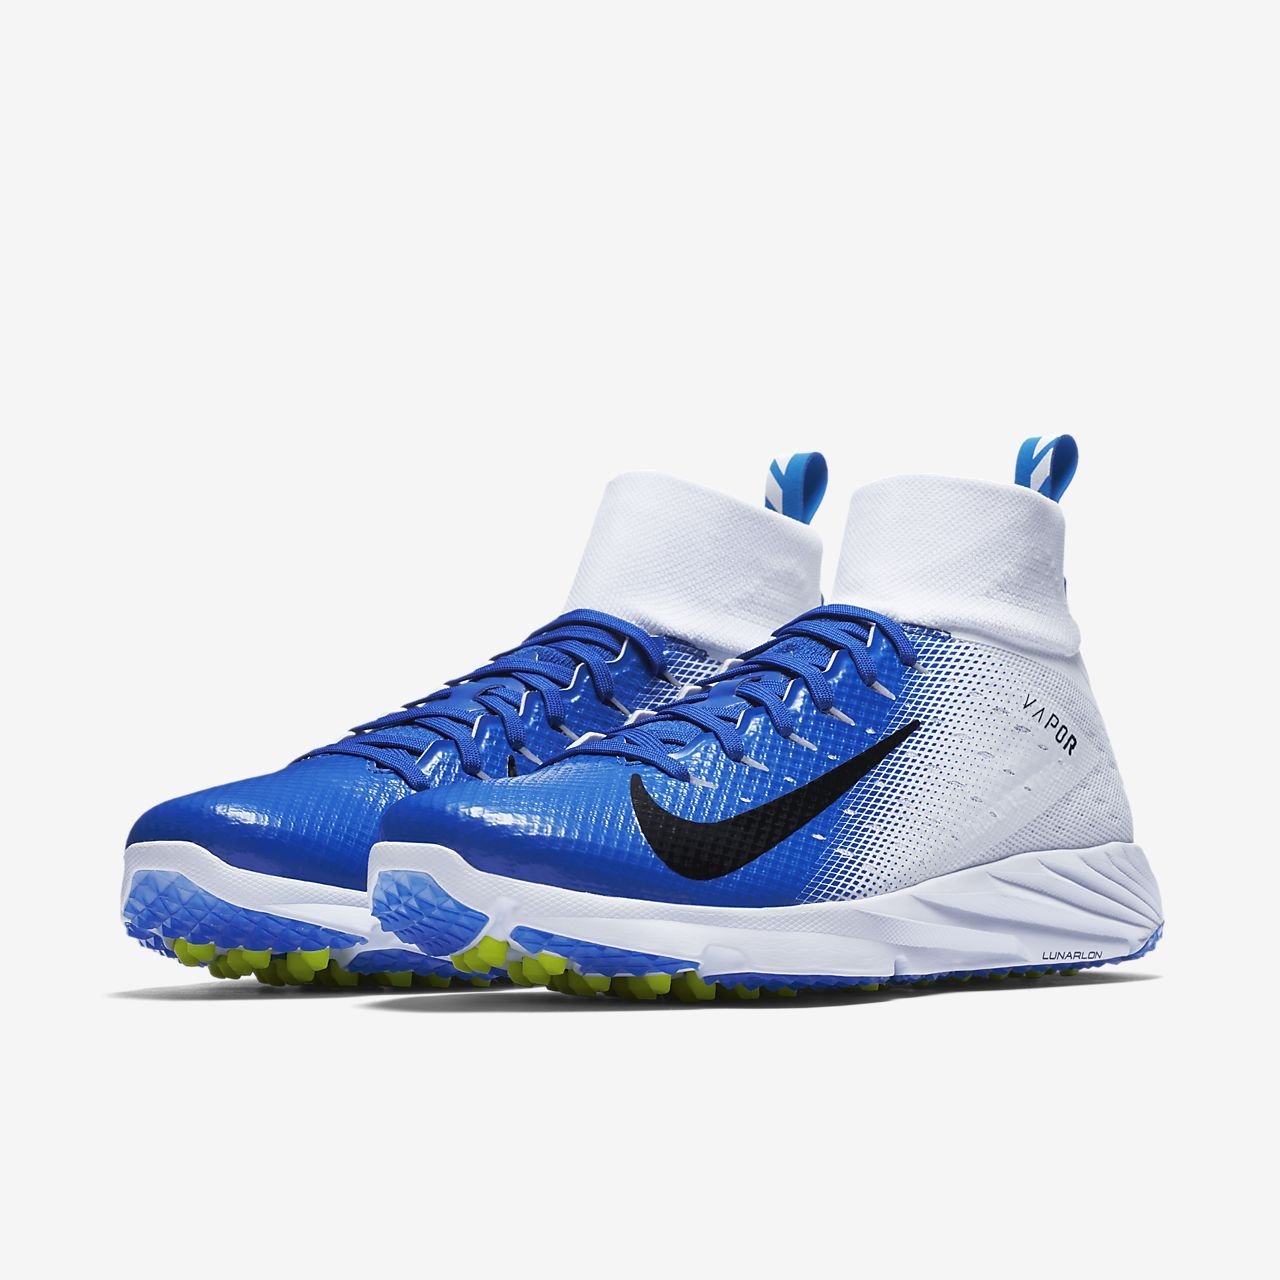 f764b7689 Nike Vapor Untouchable Speed Turf 2 Men s Football Cleat